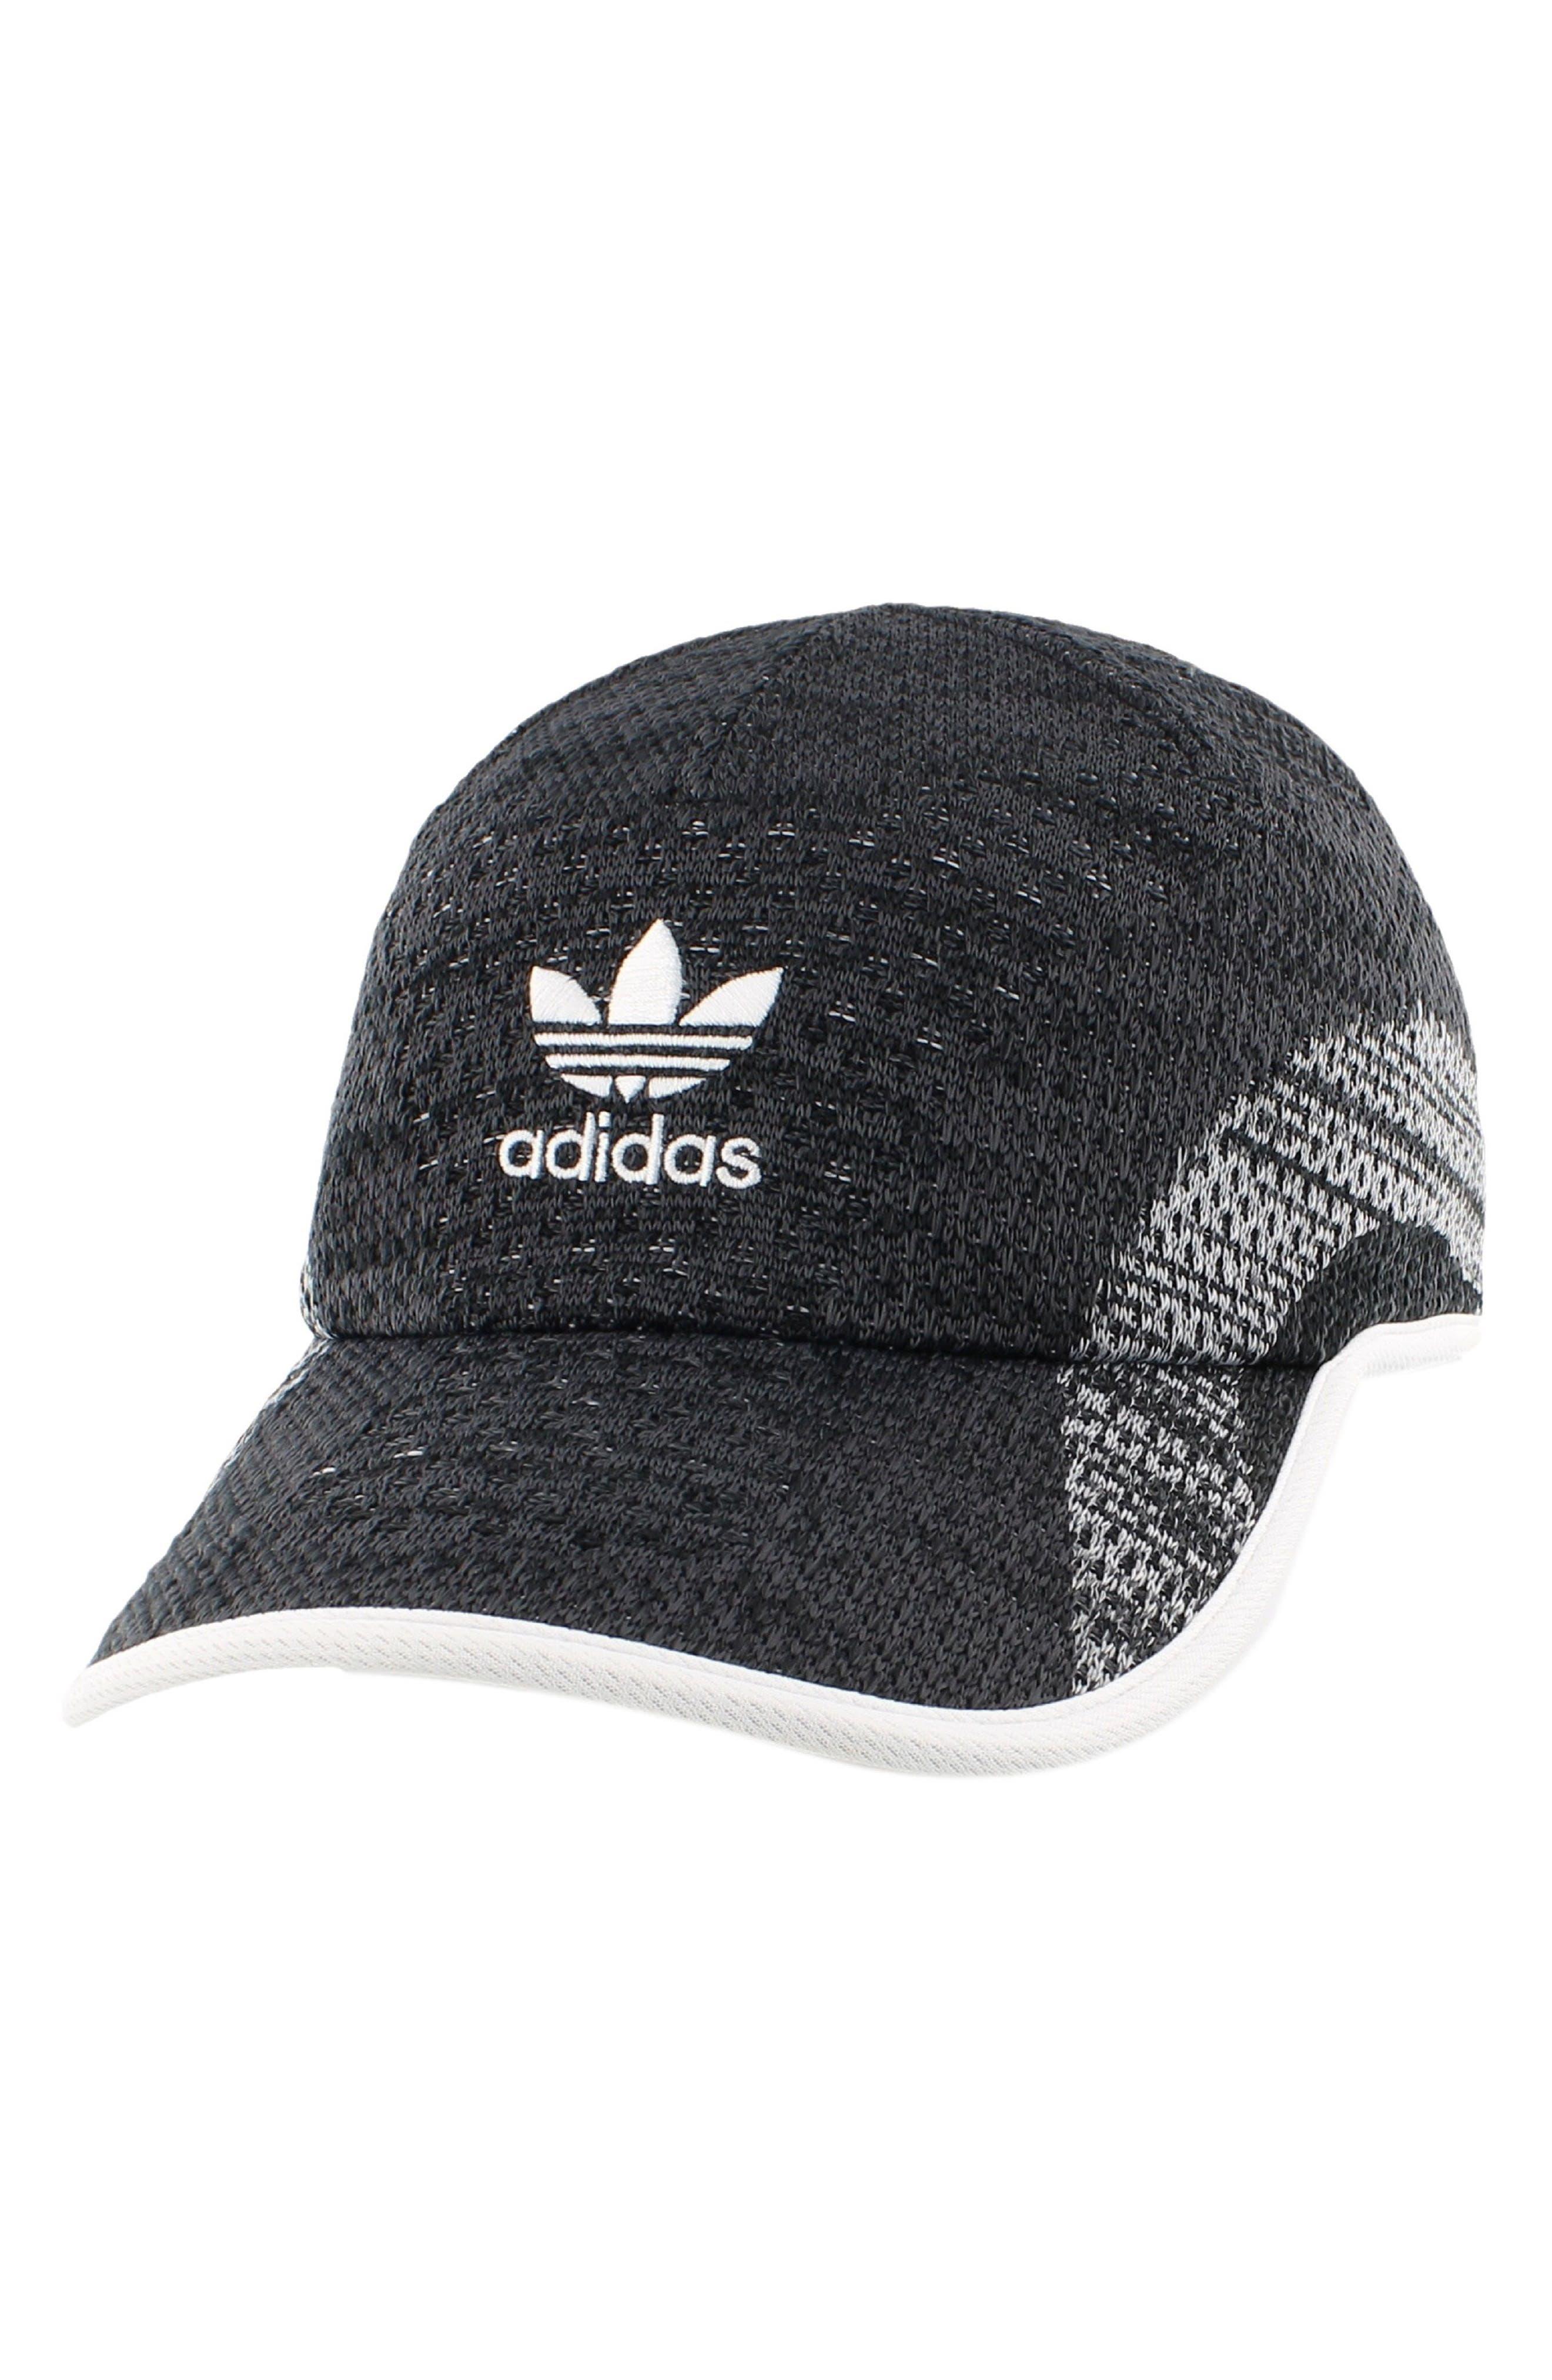 Primeknit Ball Cap,                         Main,                         color, Black/ Dark Grey/ White